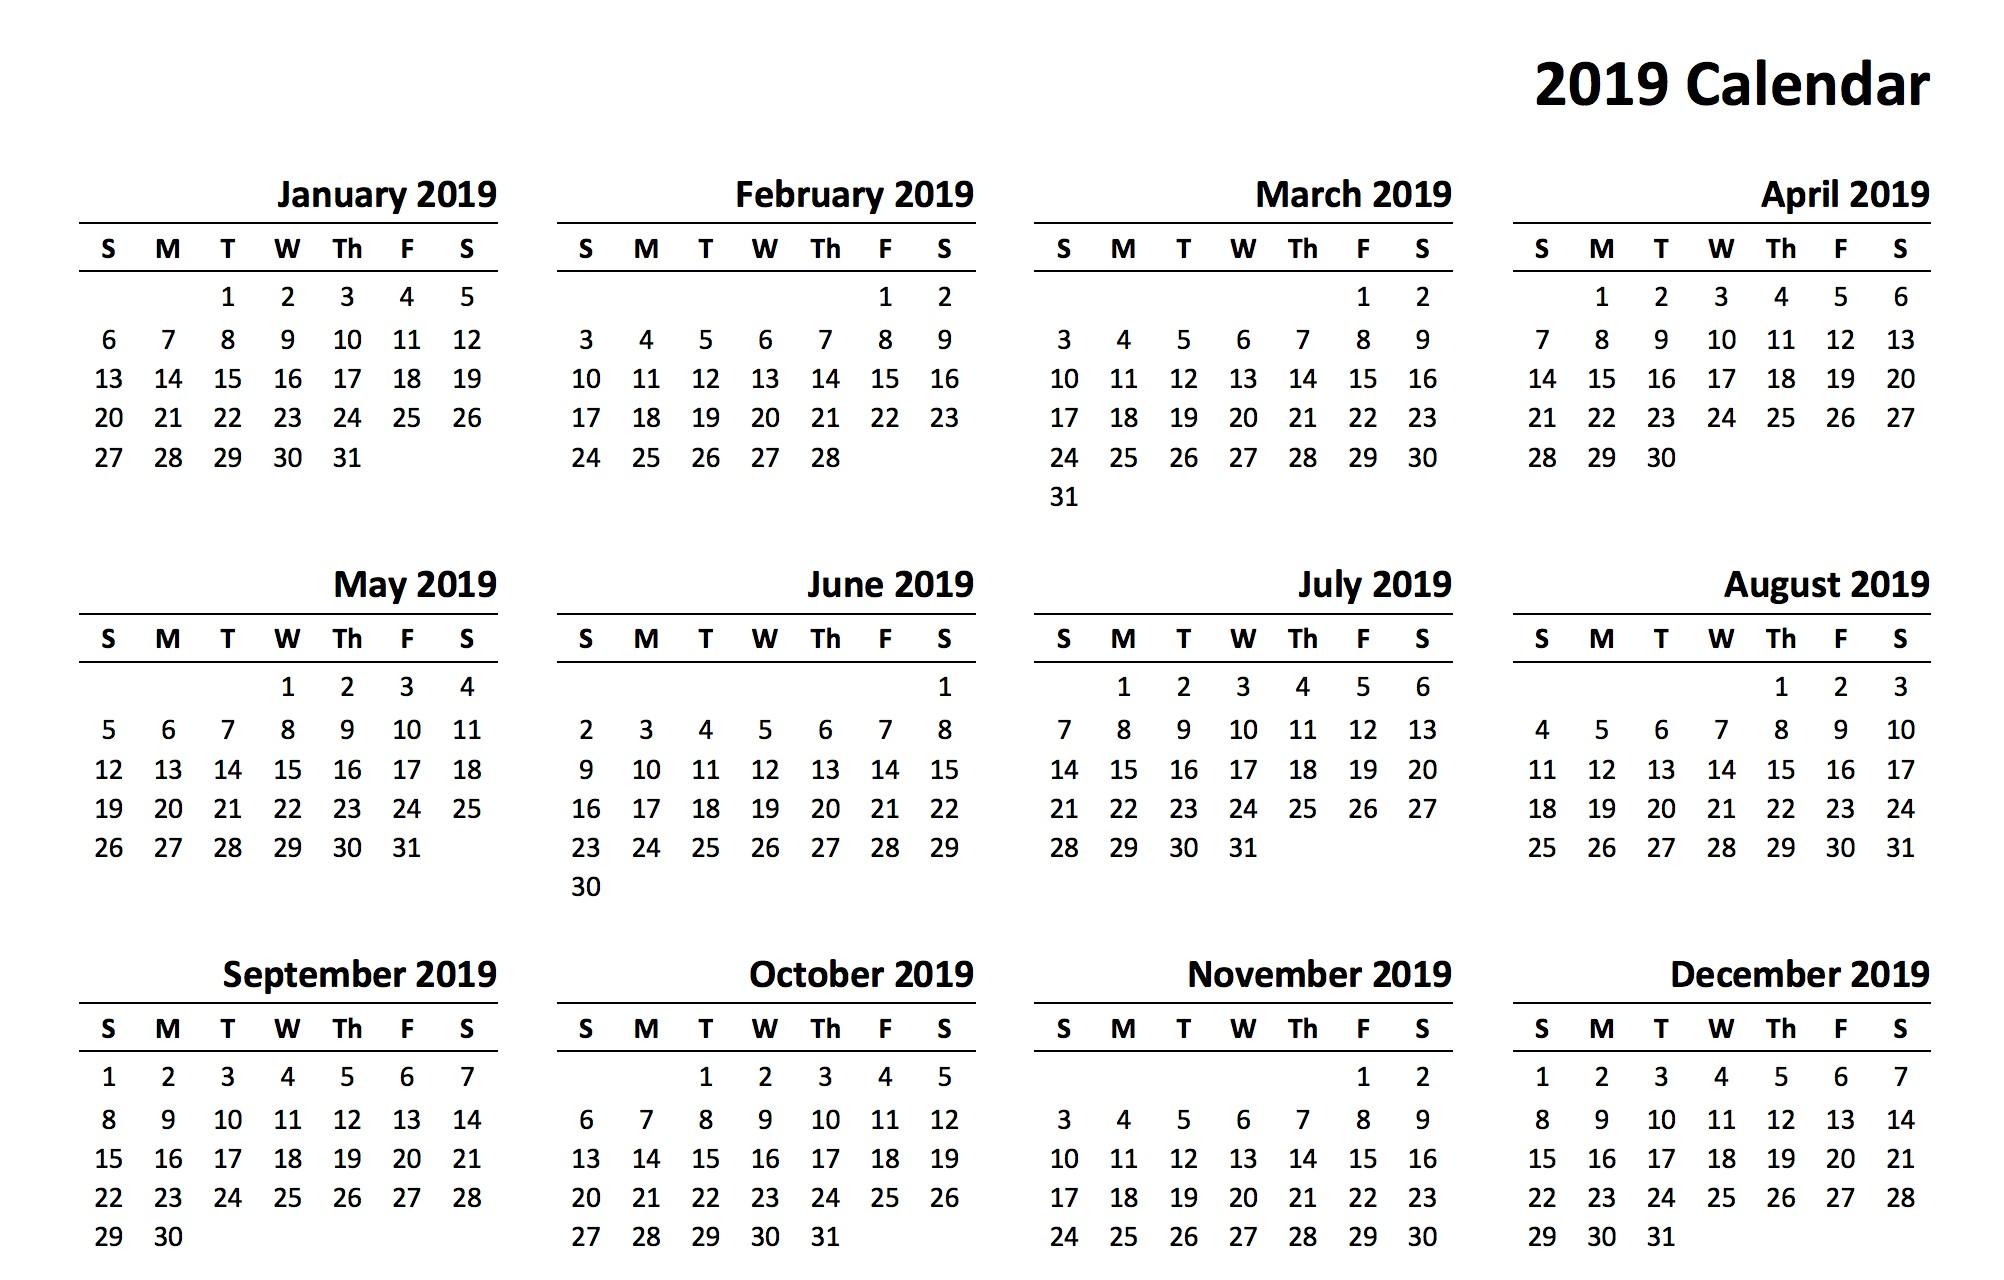 Blank Calendar 2019 Excel Más Arriba-a-fecha 12 Month Calendar 2019 Printable Of Blank Calendar 2019 Excel Más Reciente Free Printable 2019 Calendar